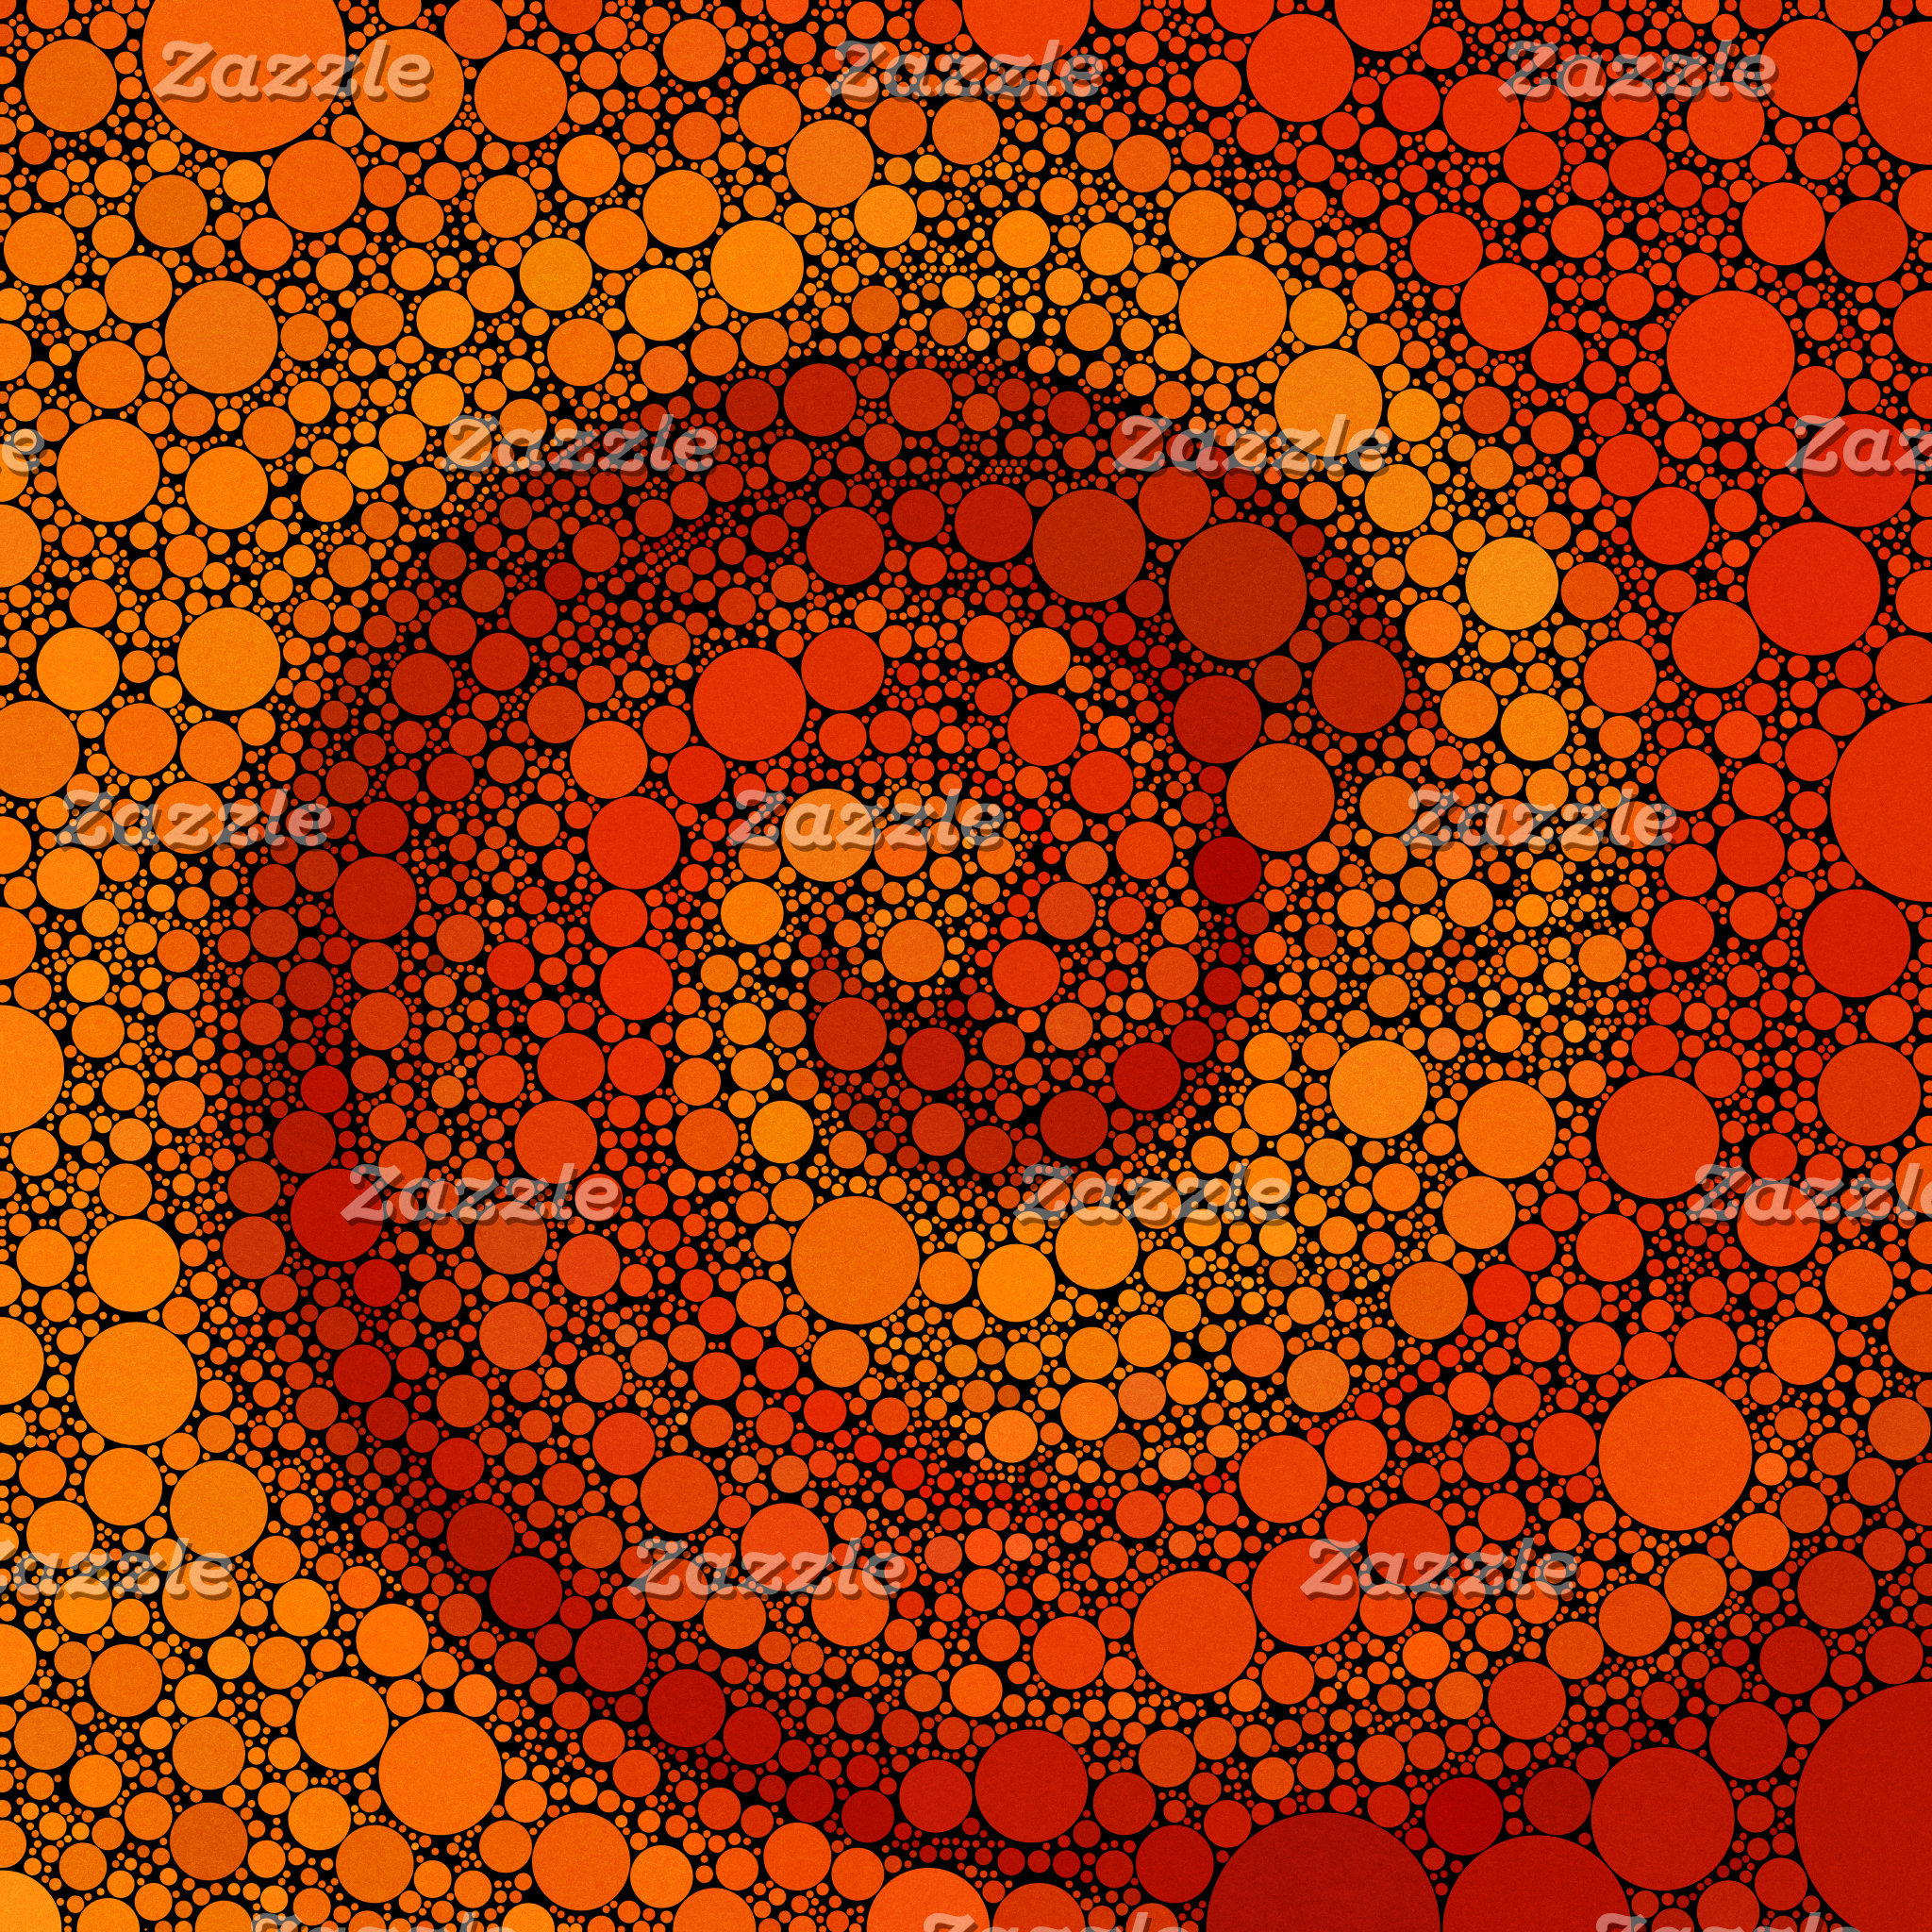 Geometric Patterns | Orange and Red Circles